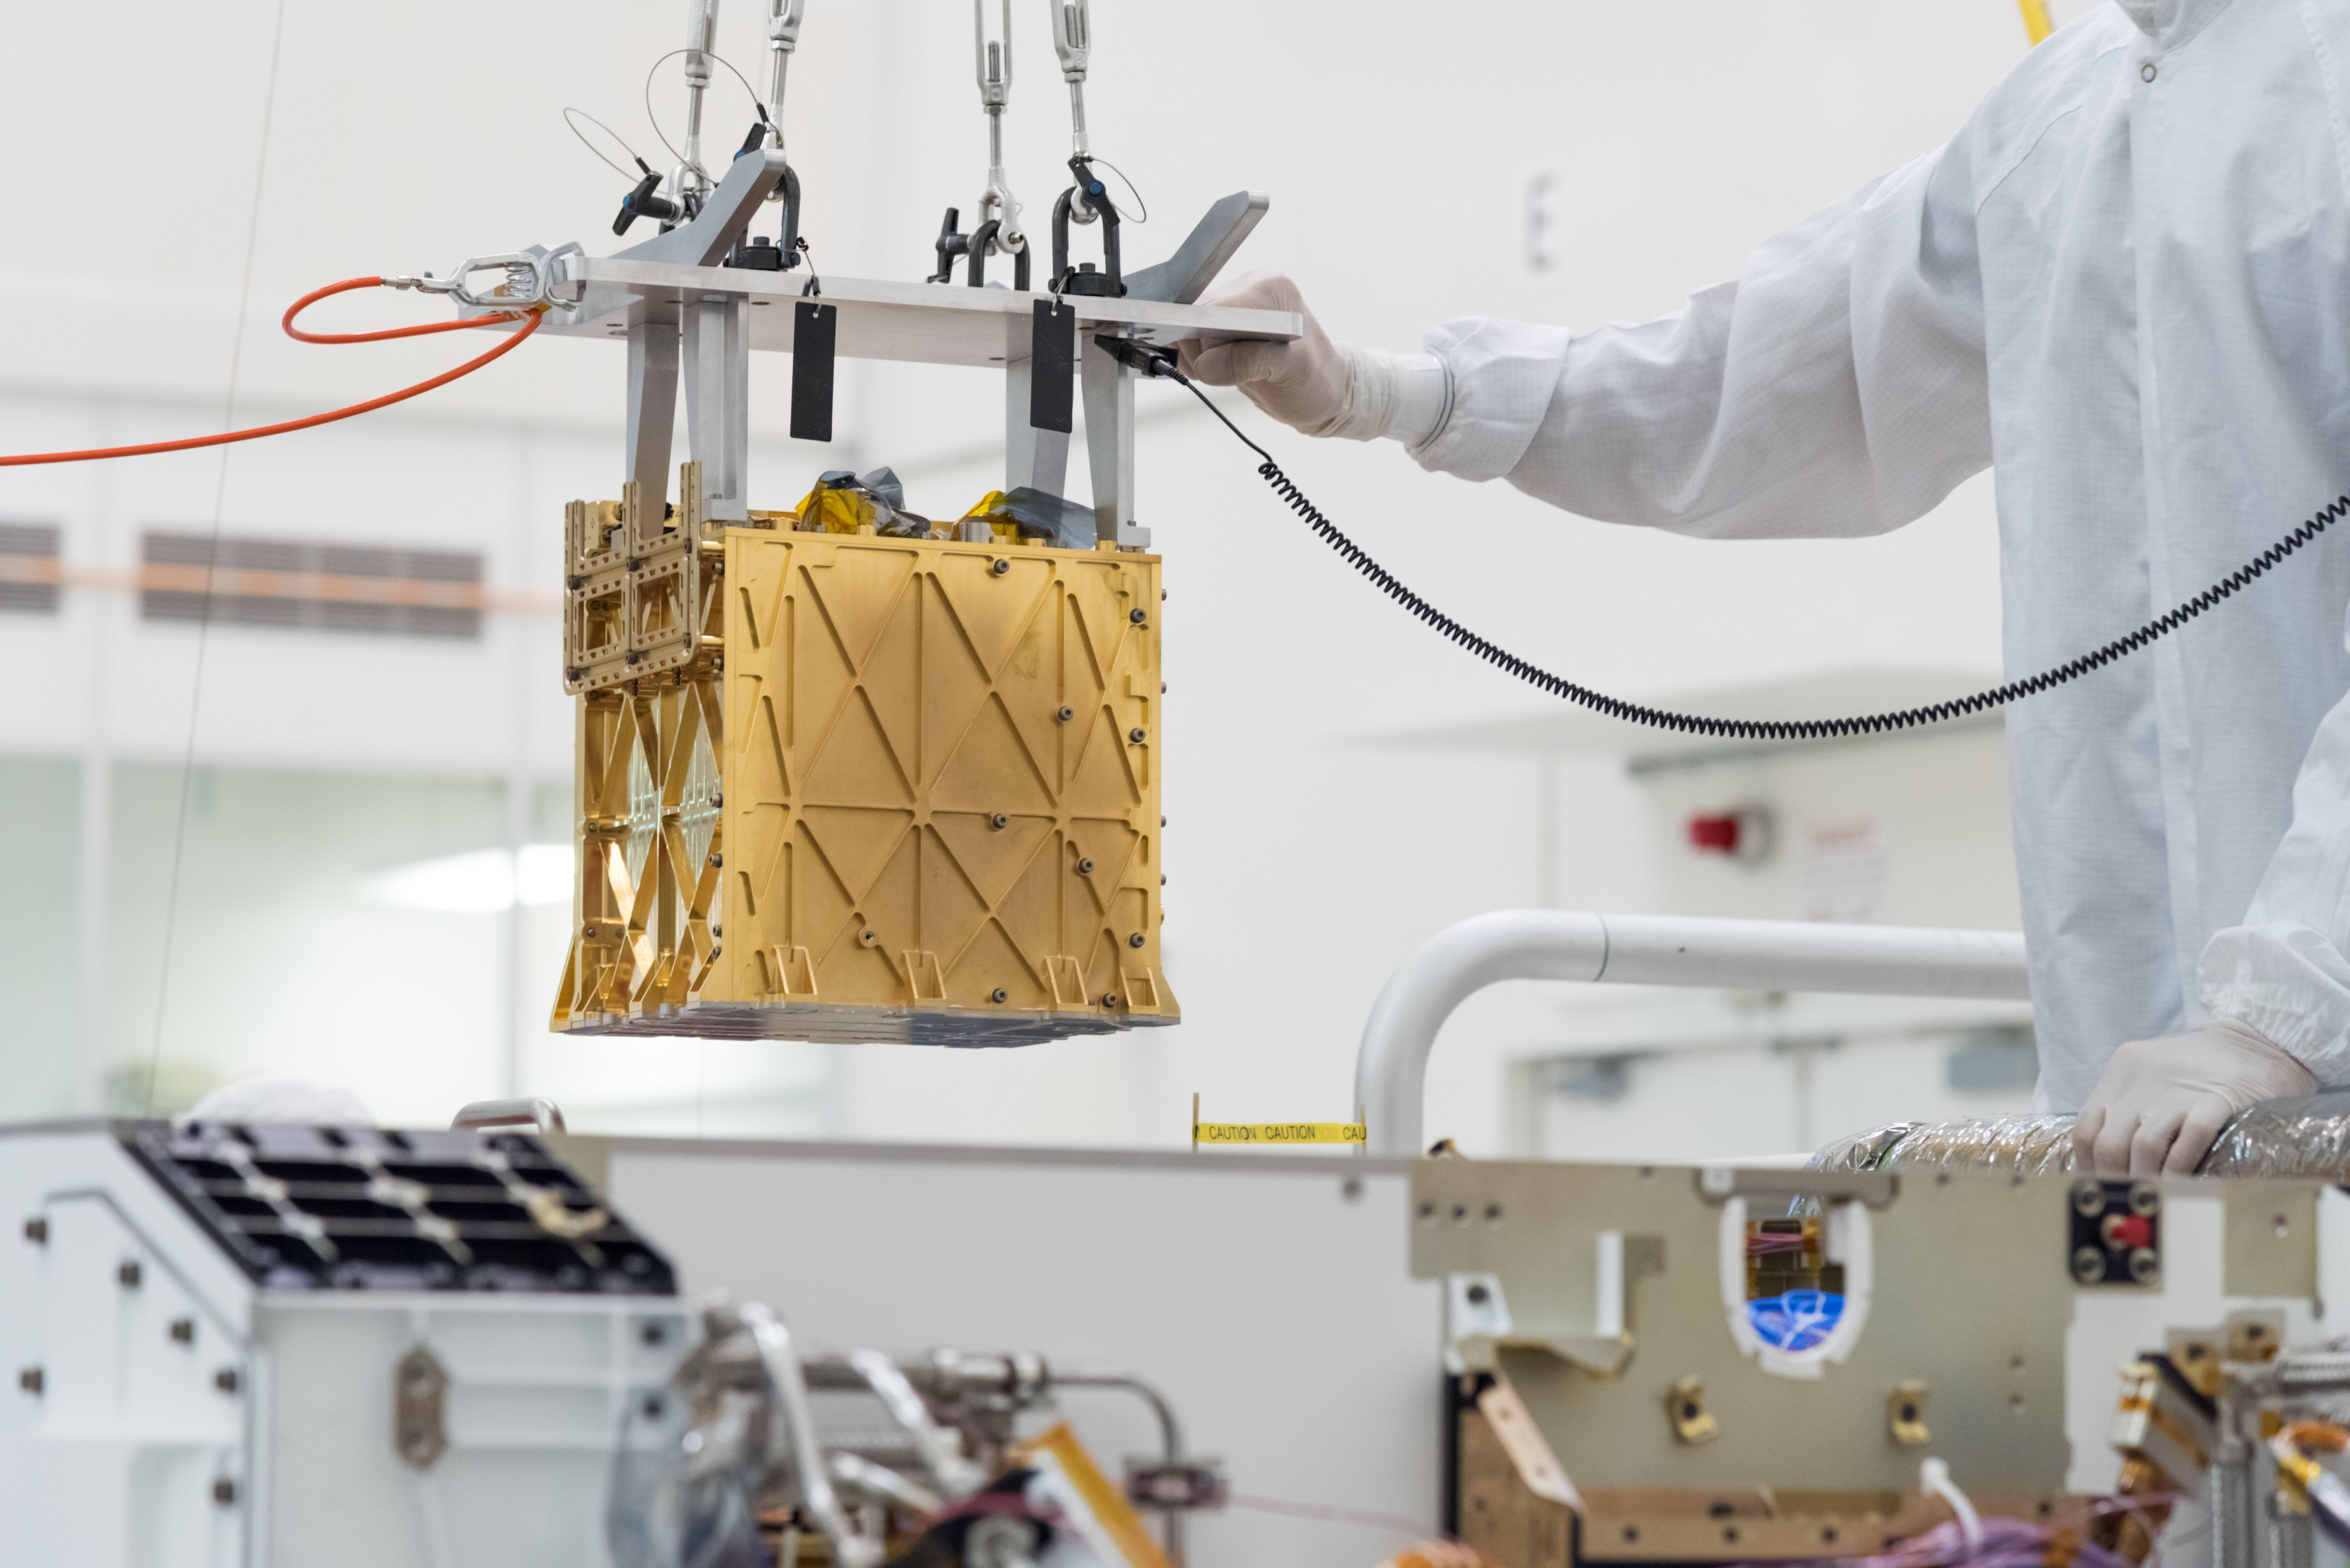 Technicians at NASA's Jet Propulsion Laboratory in La Cañada Flintridge, California, lower the Mars Oxygen In-Situ Res